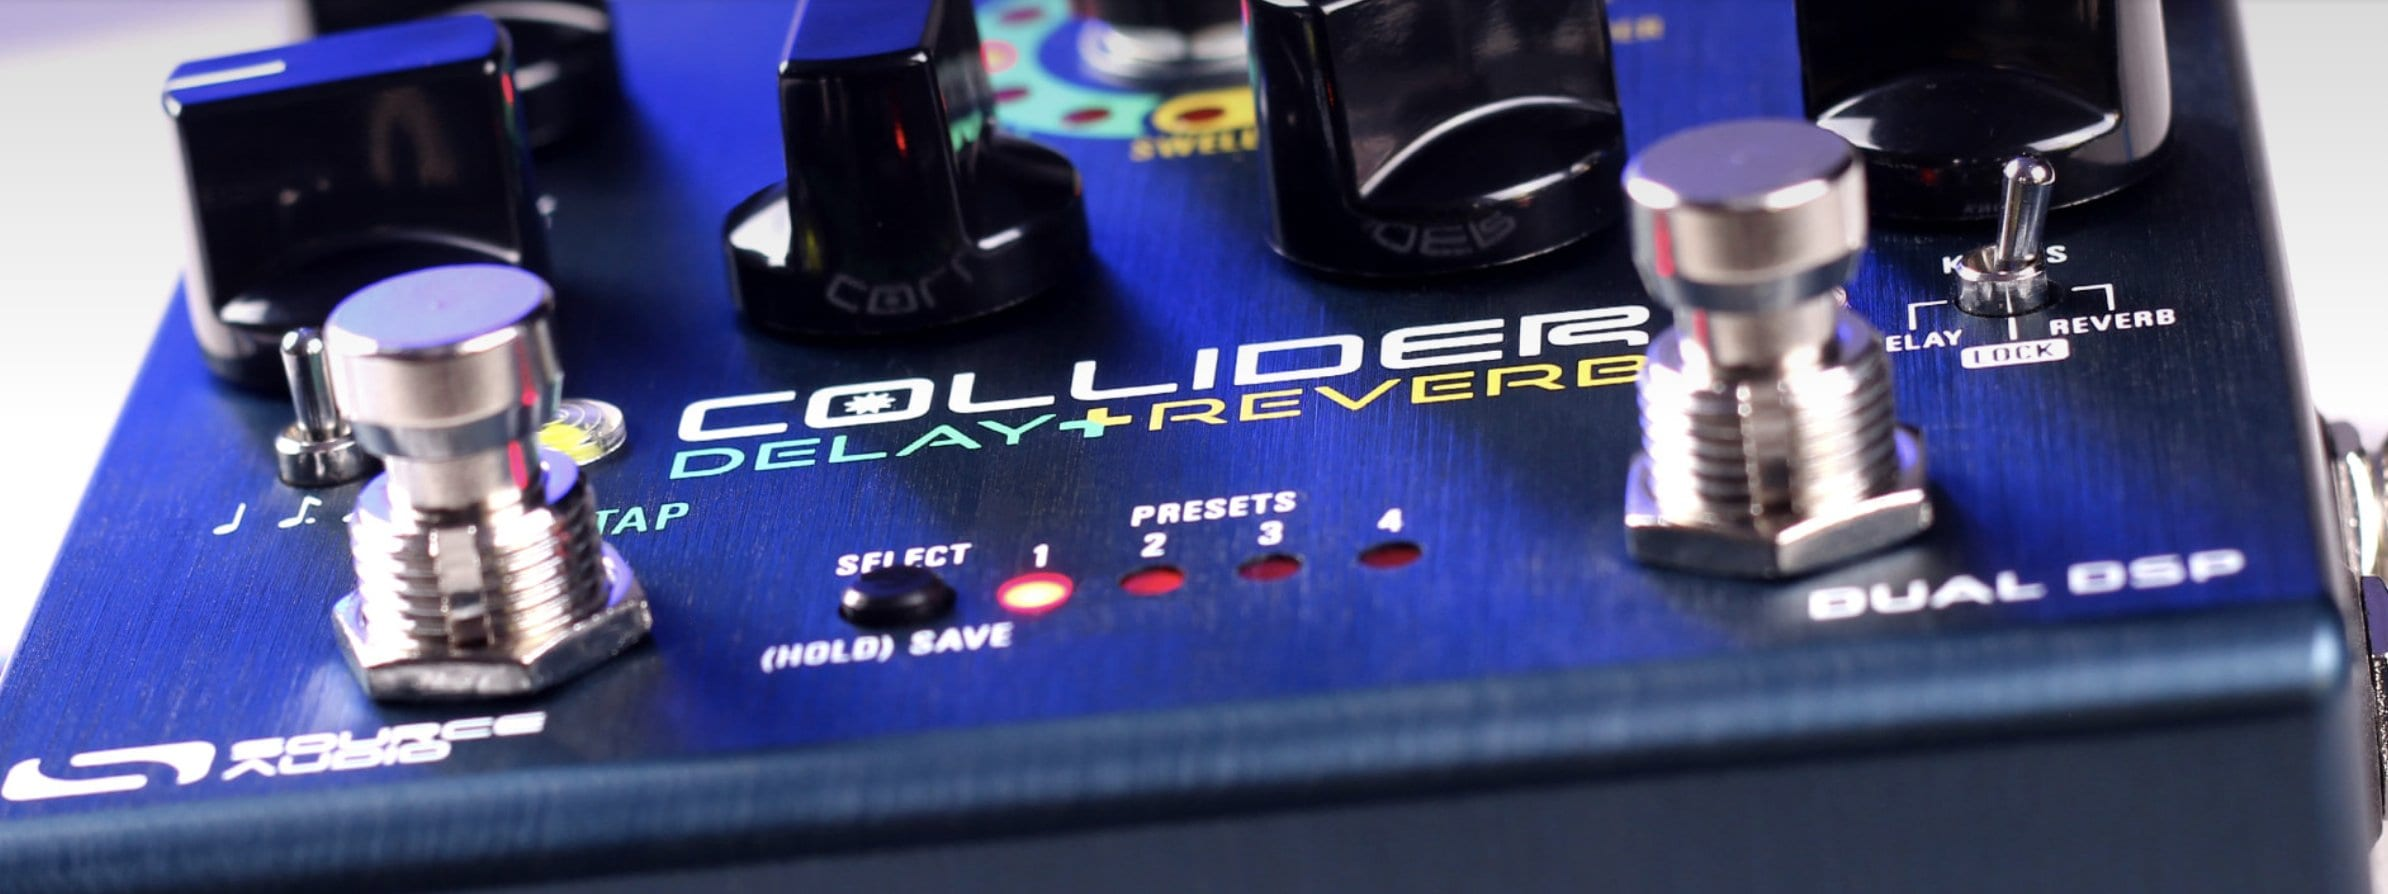 Source Audio Collider Delay + Reverb